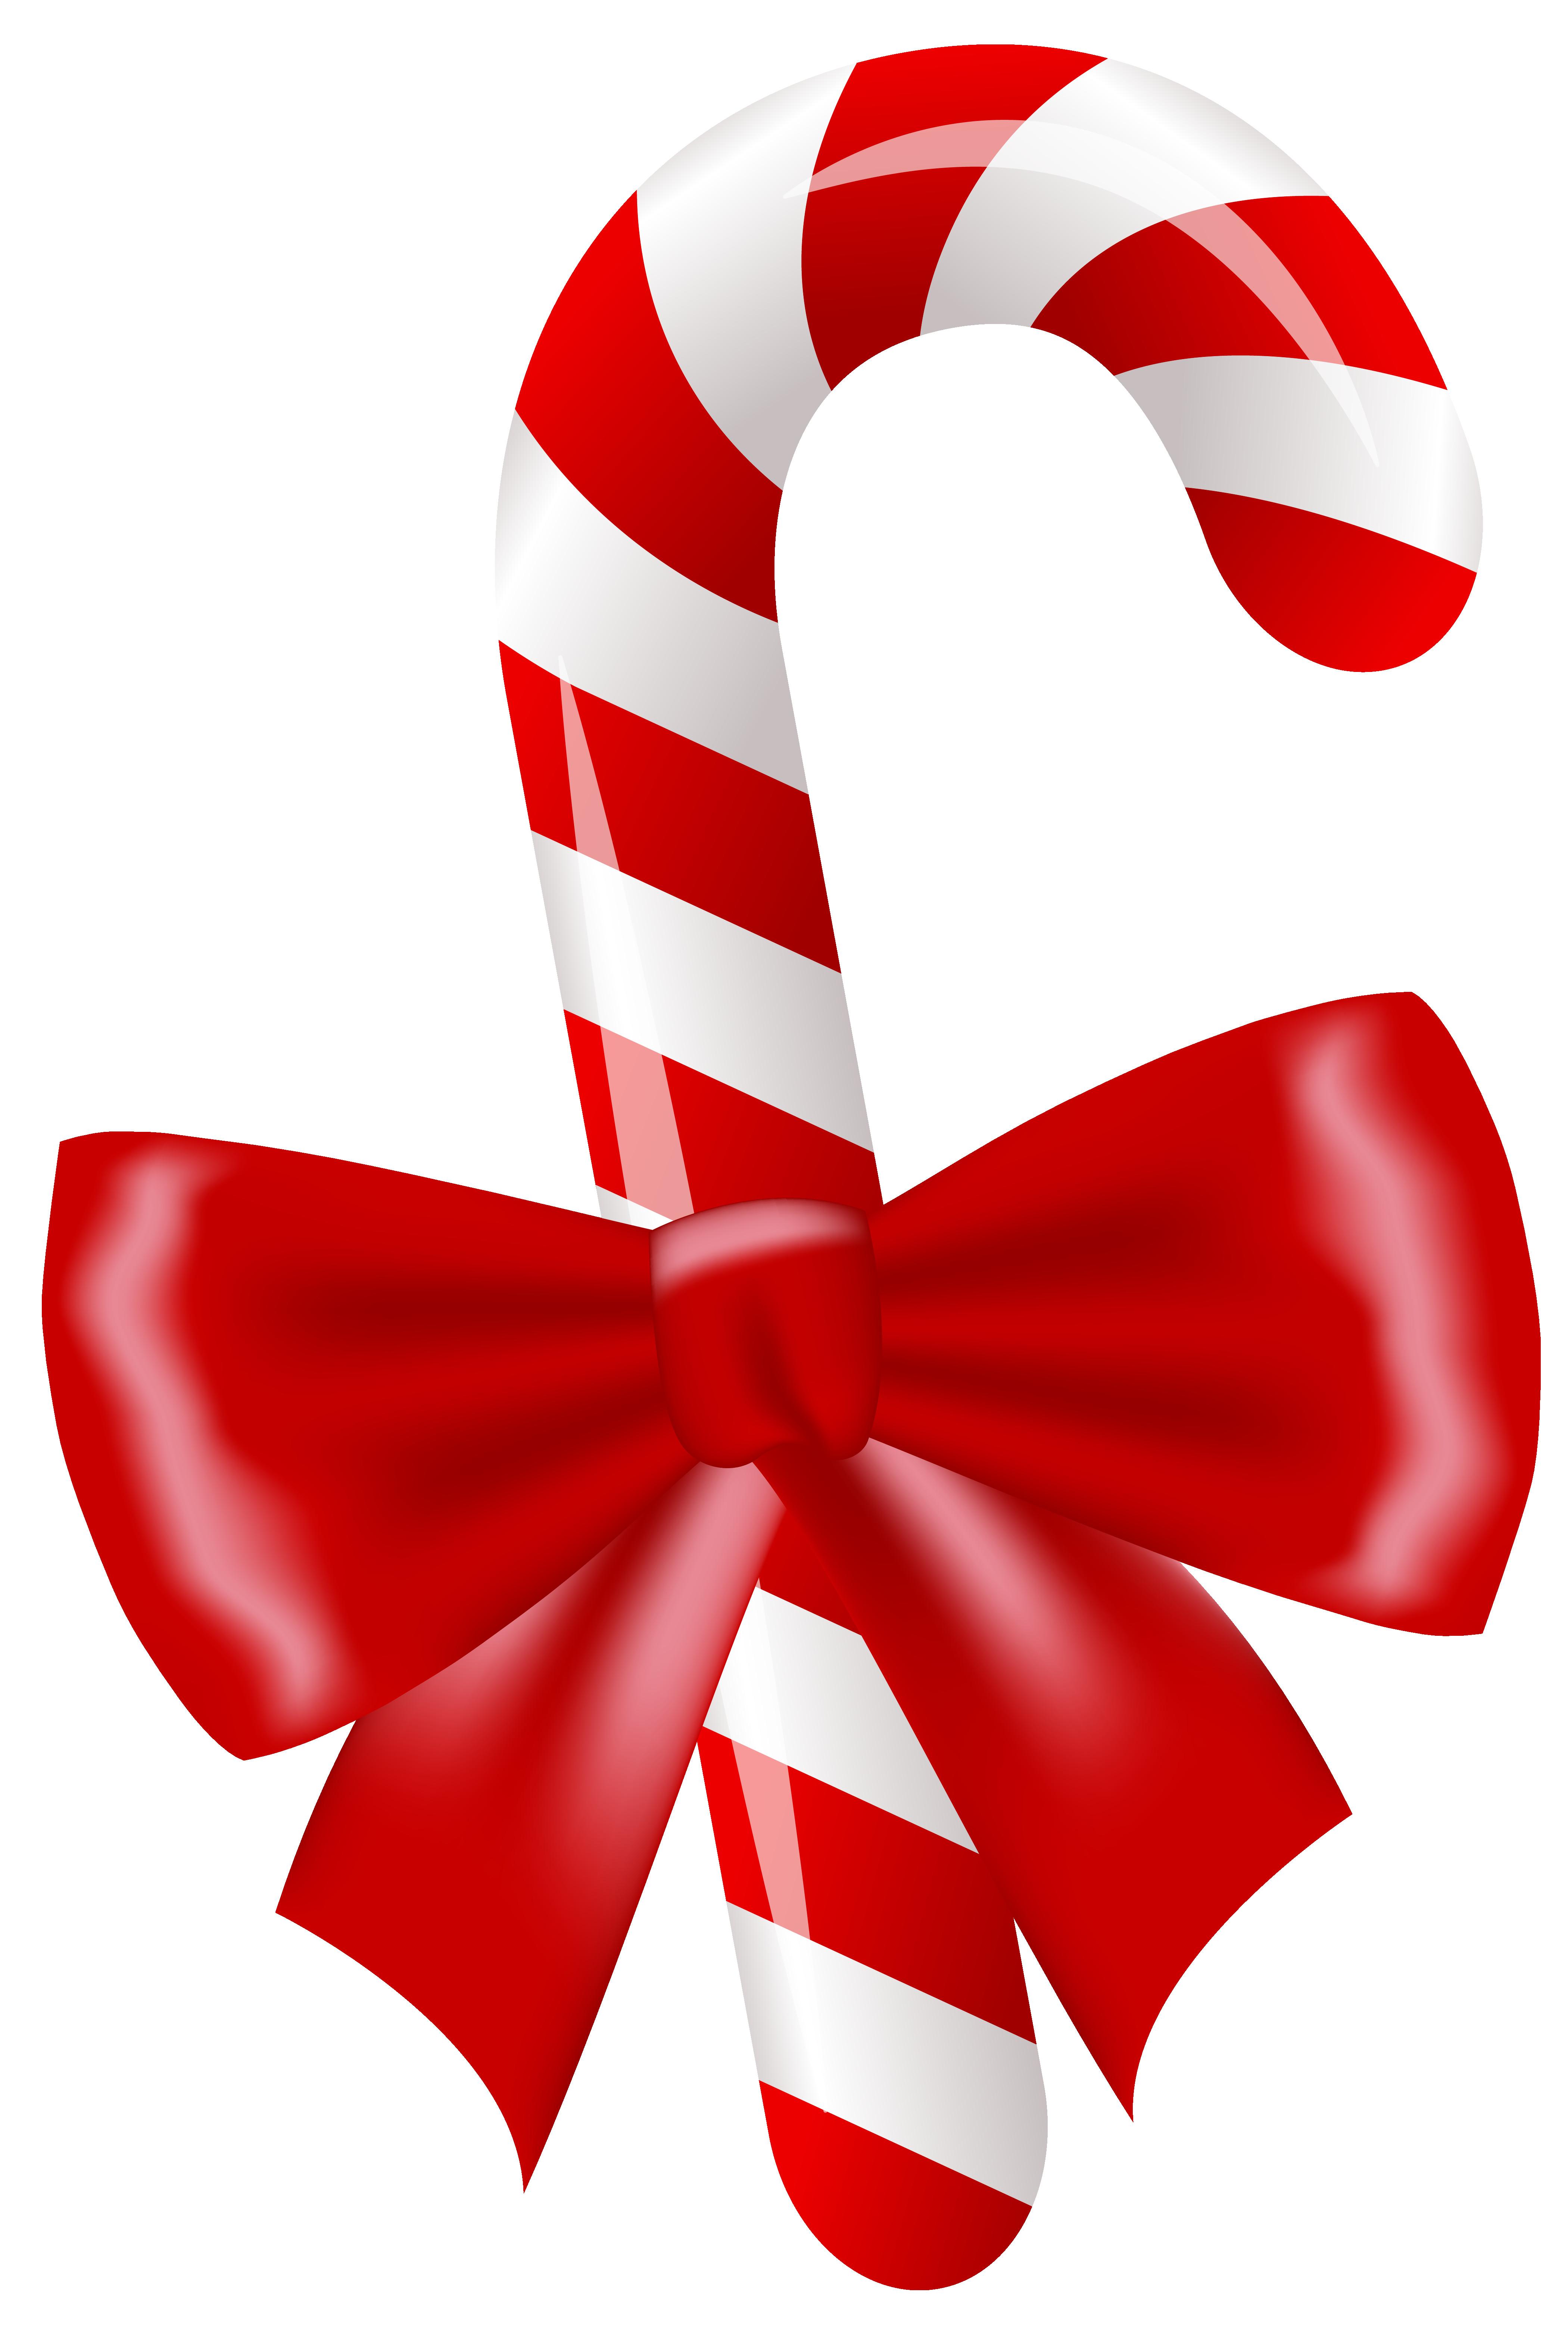 Christmas Candy Cane Images  Christmas candy cane image black and white techFlourish